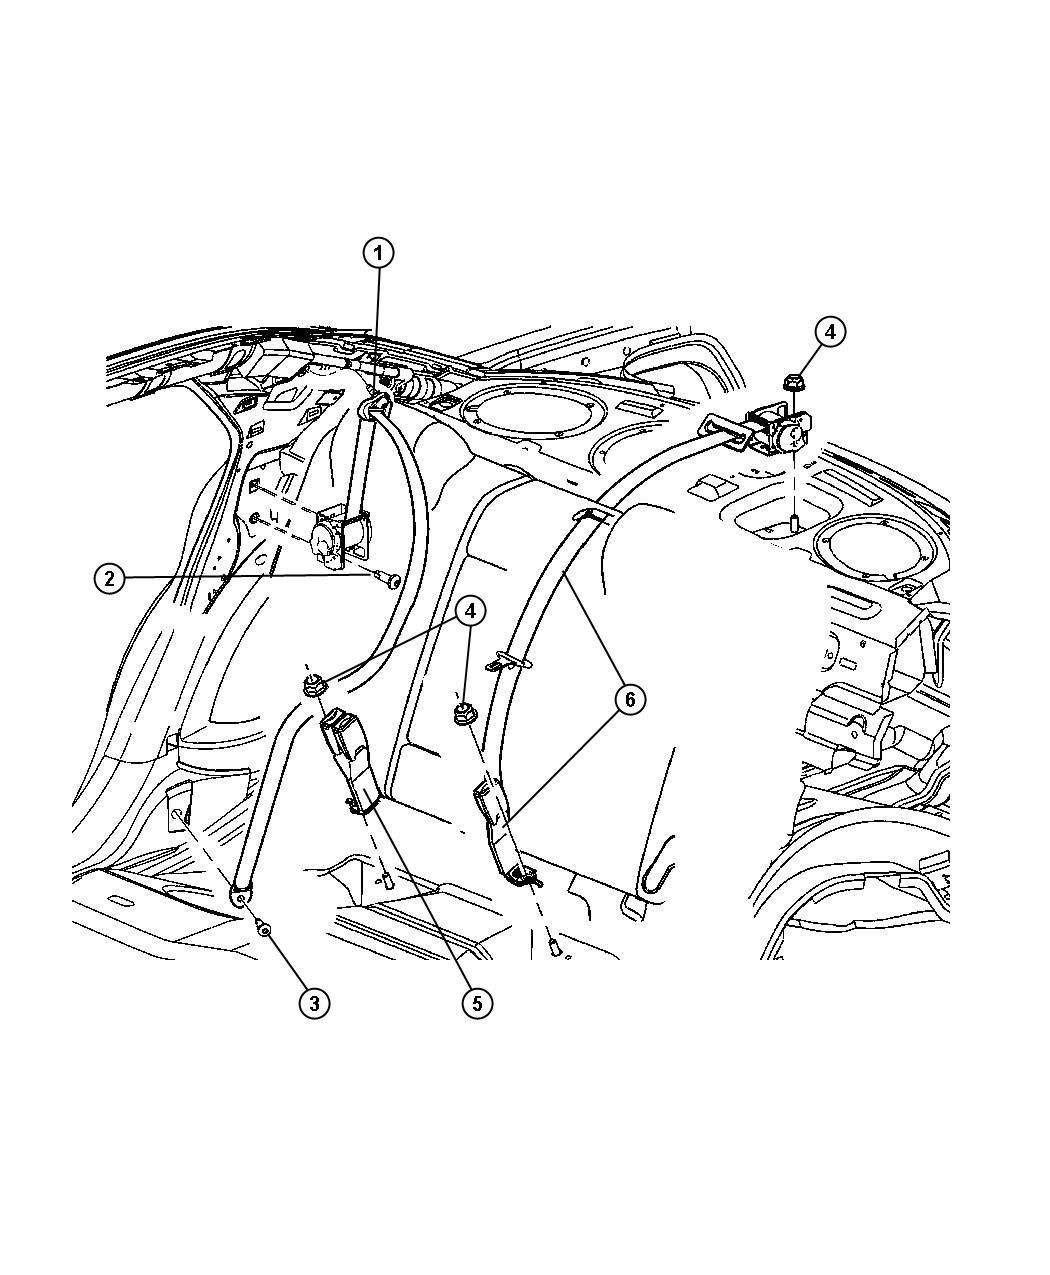 Dodge Charger Seat Belt  Rear Center Shoulder  Trim   All Trim Codes  Color   Dk Khaki